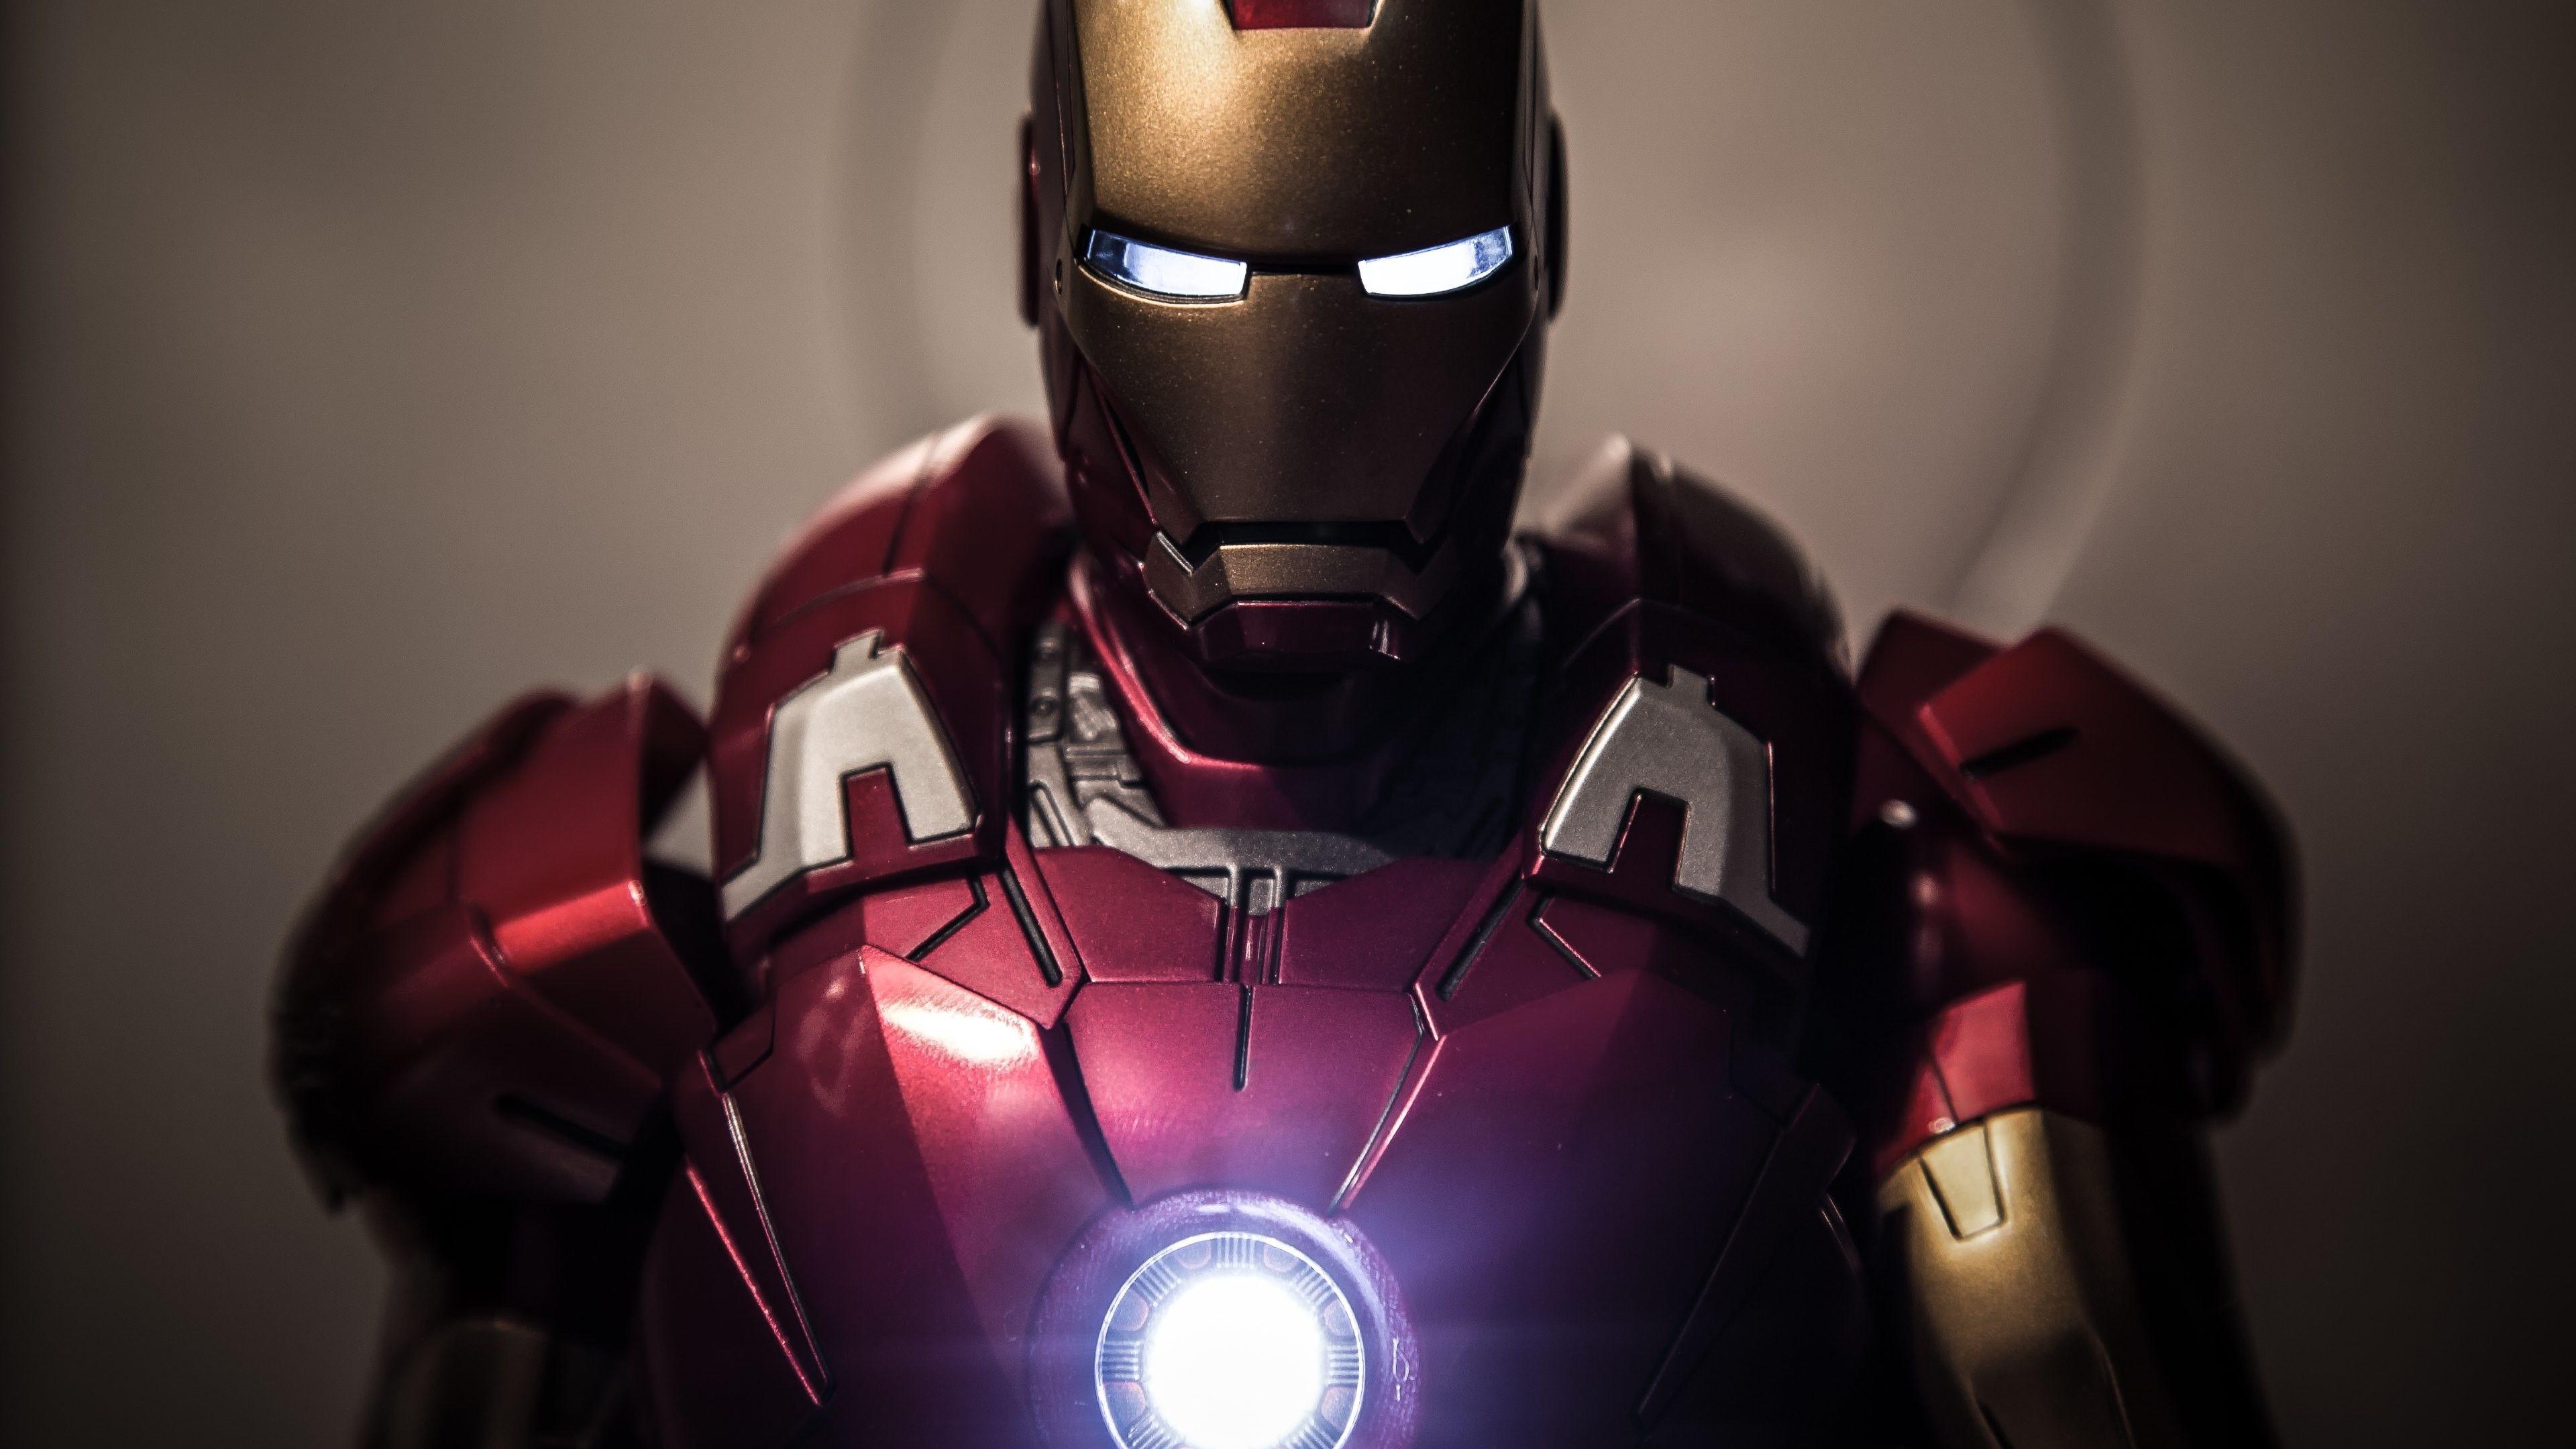 3840x2160 Preview Wallpaper Iron Man Tony Stark Superhero 3840x2160 Iron Man Wallpaper Iron Man Hd Wallpaper Iron Man